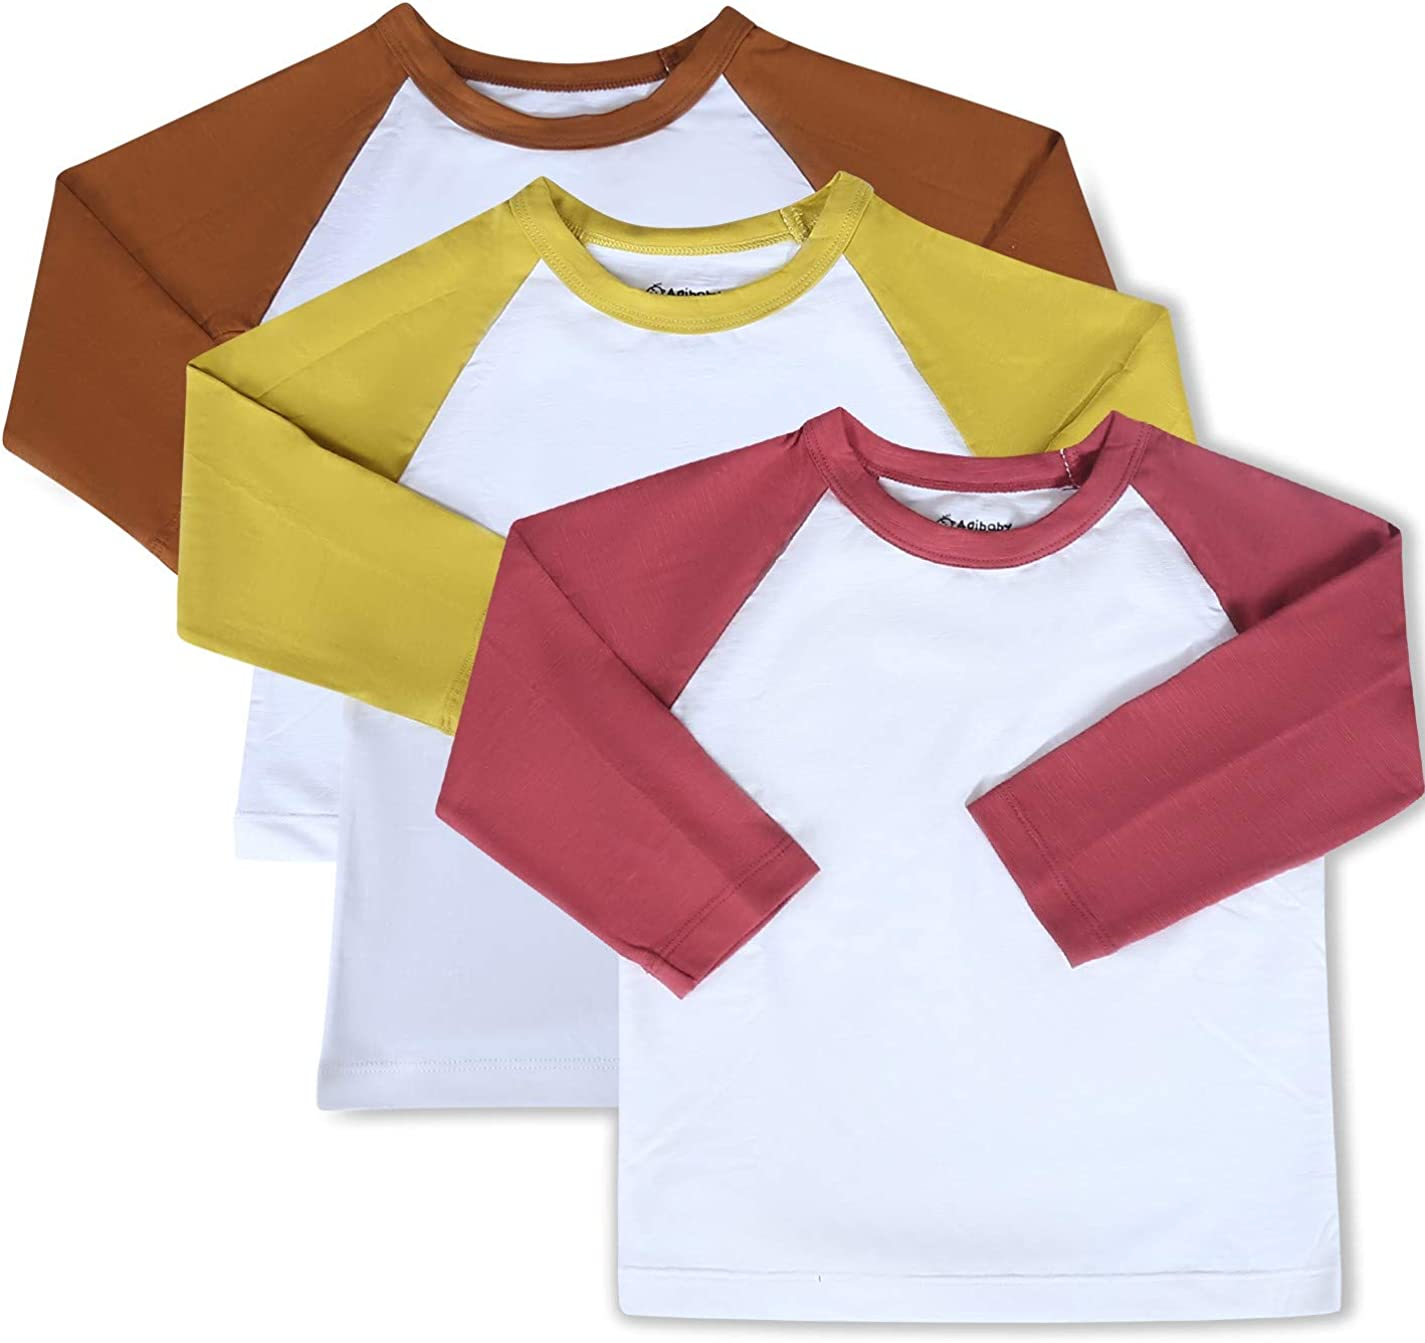 Agibaby 3-Pack| Toddler & Baby Boys & Girls Long Sleeve Raglan Baseball and Pocket T Shirts| Cotton